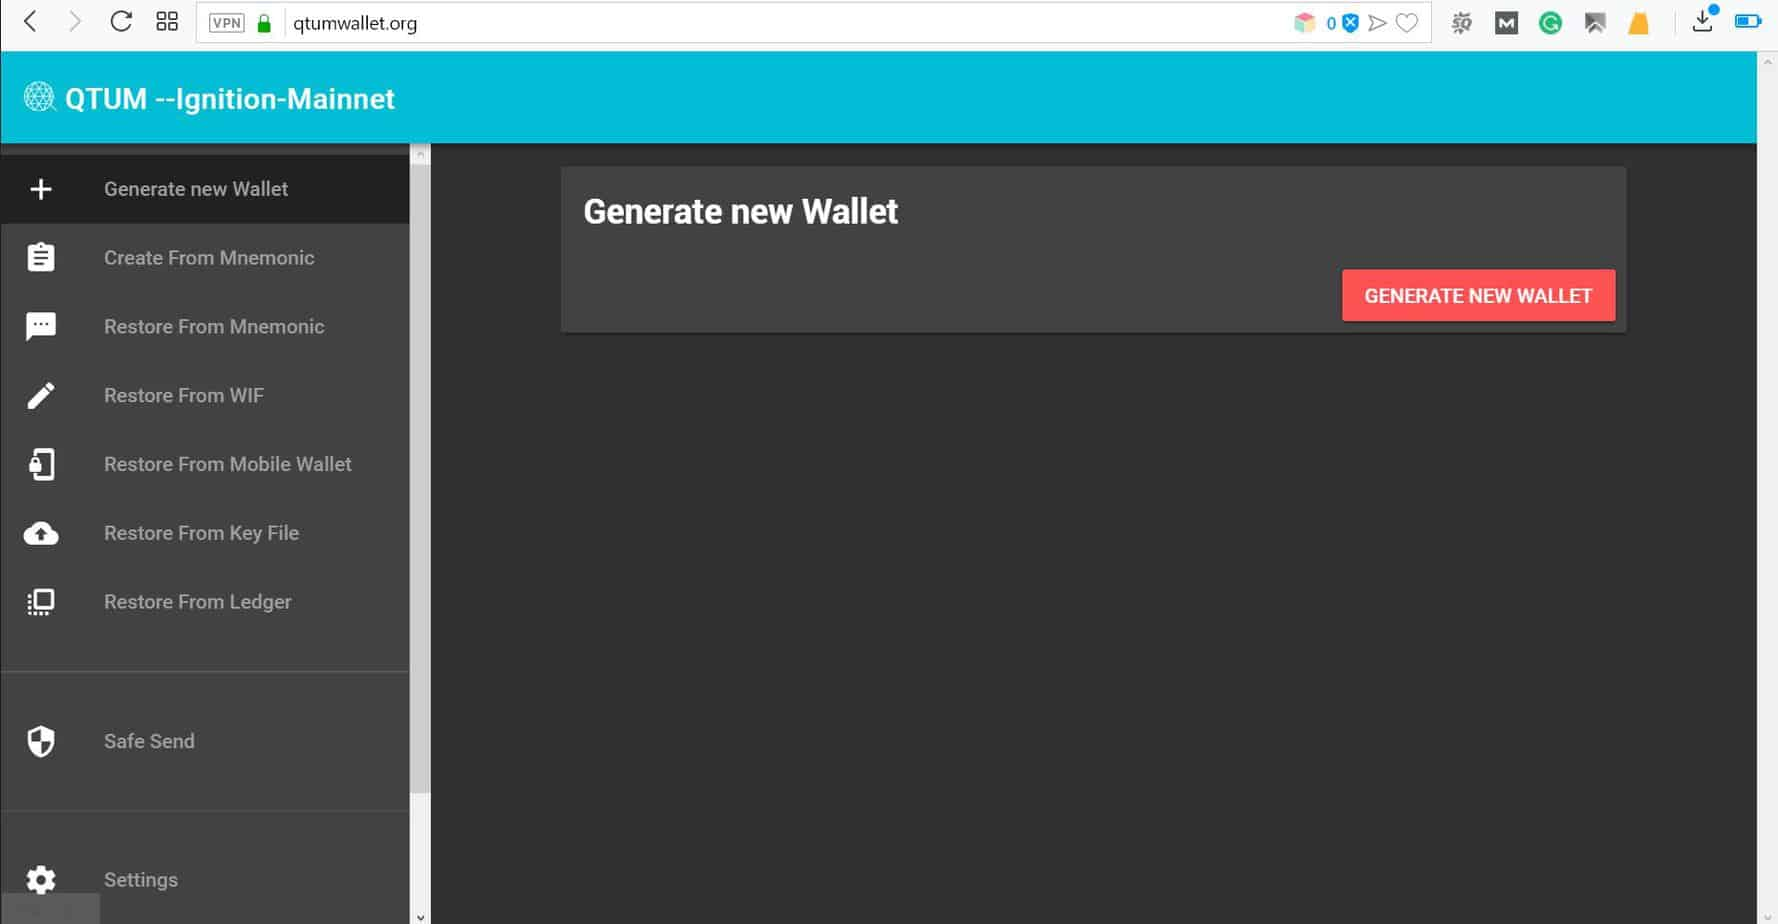 qtum-web-wallet